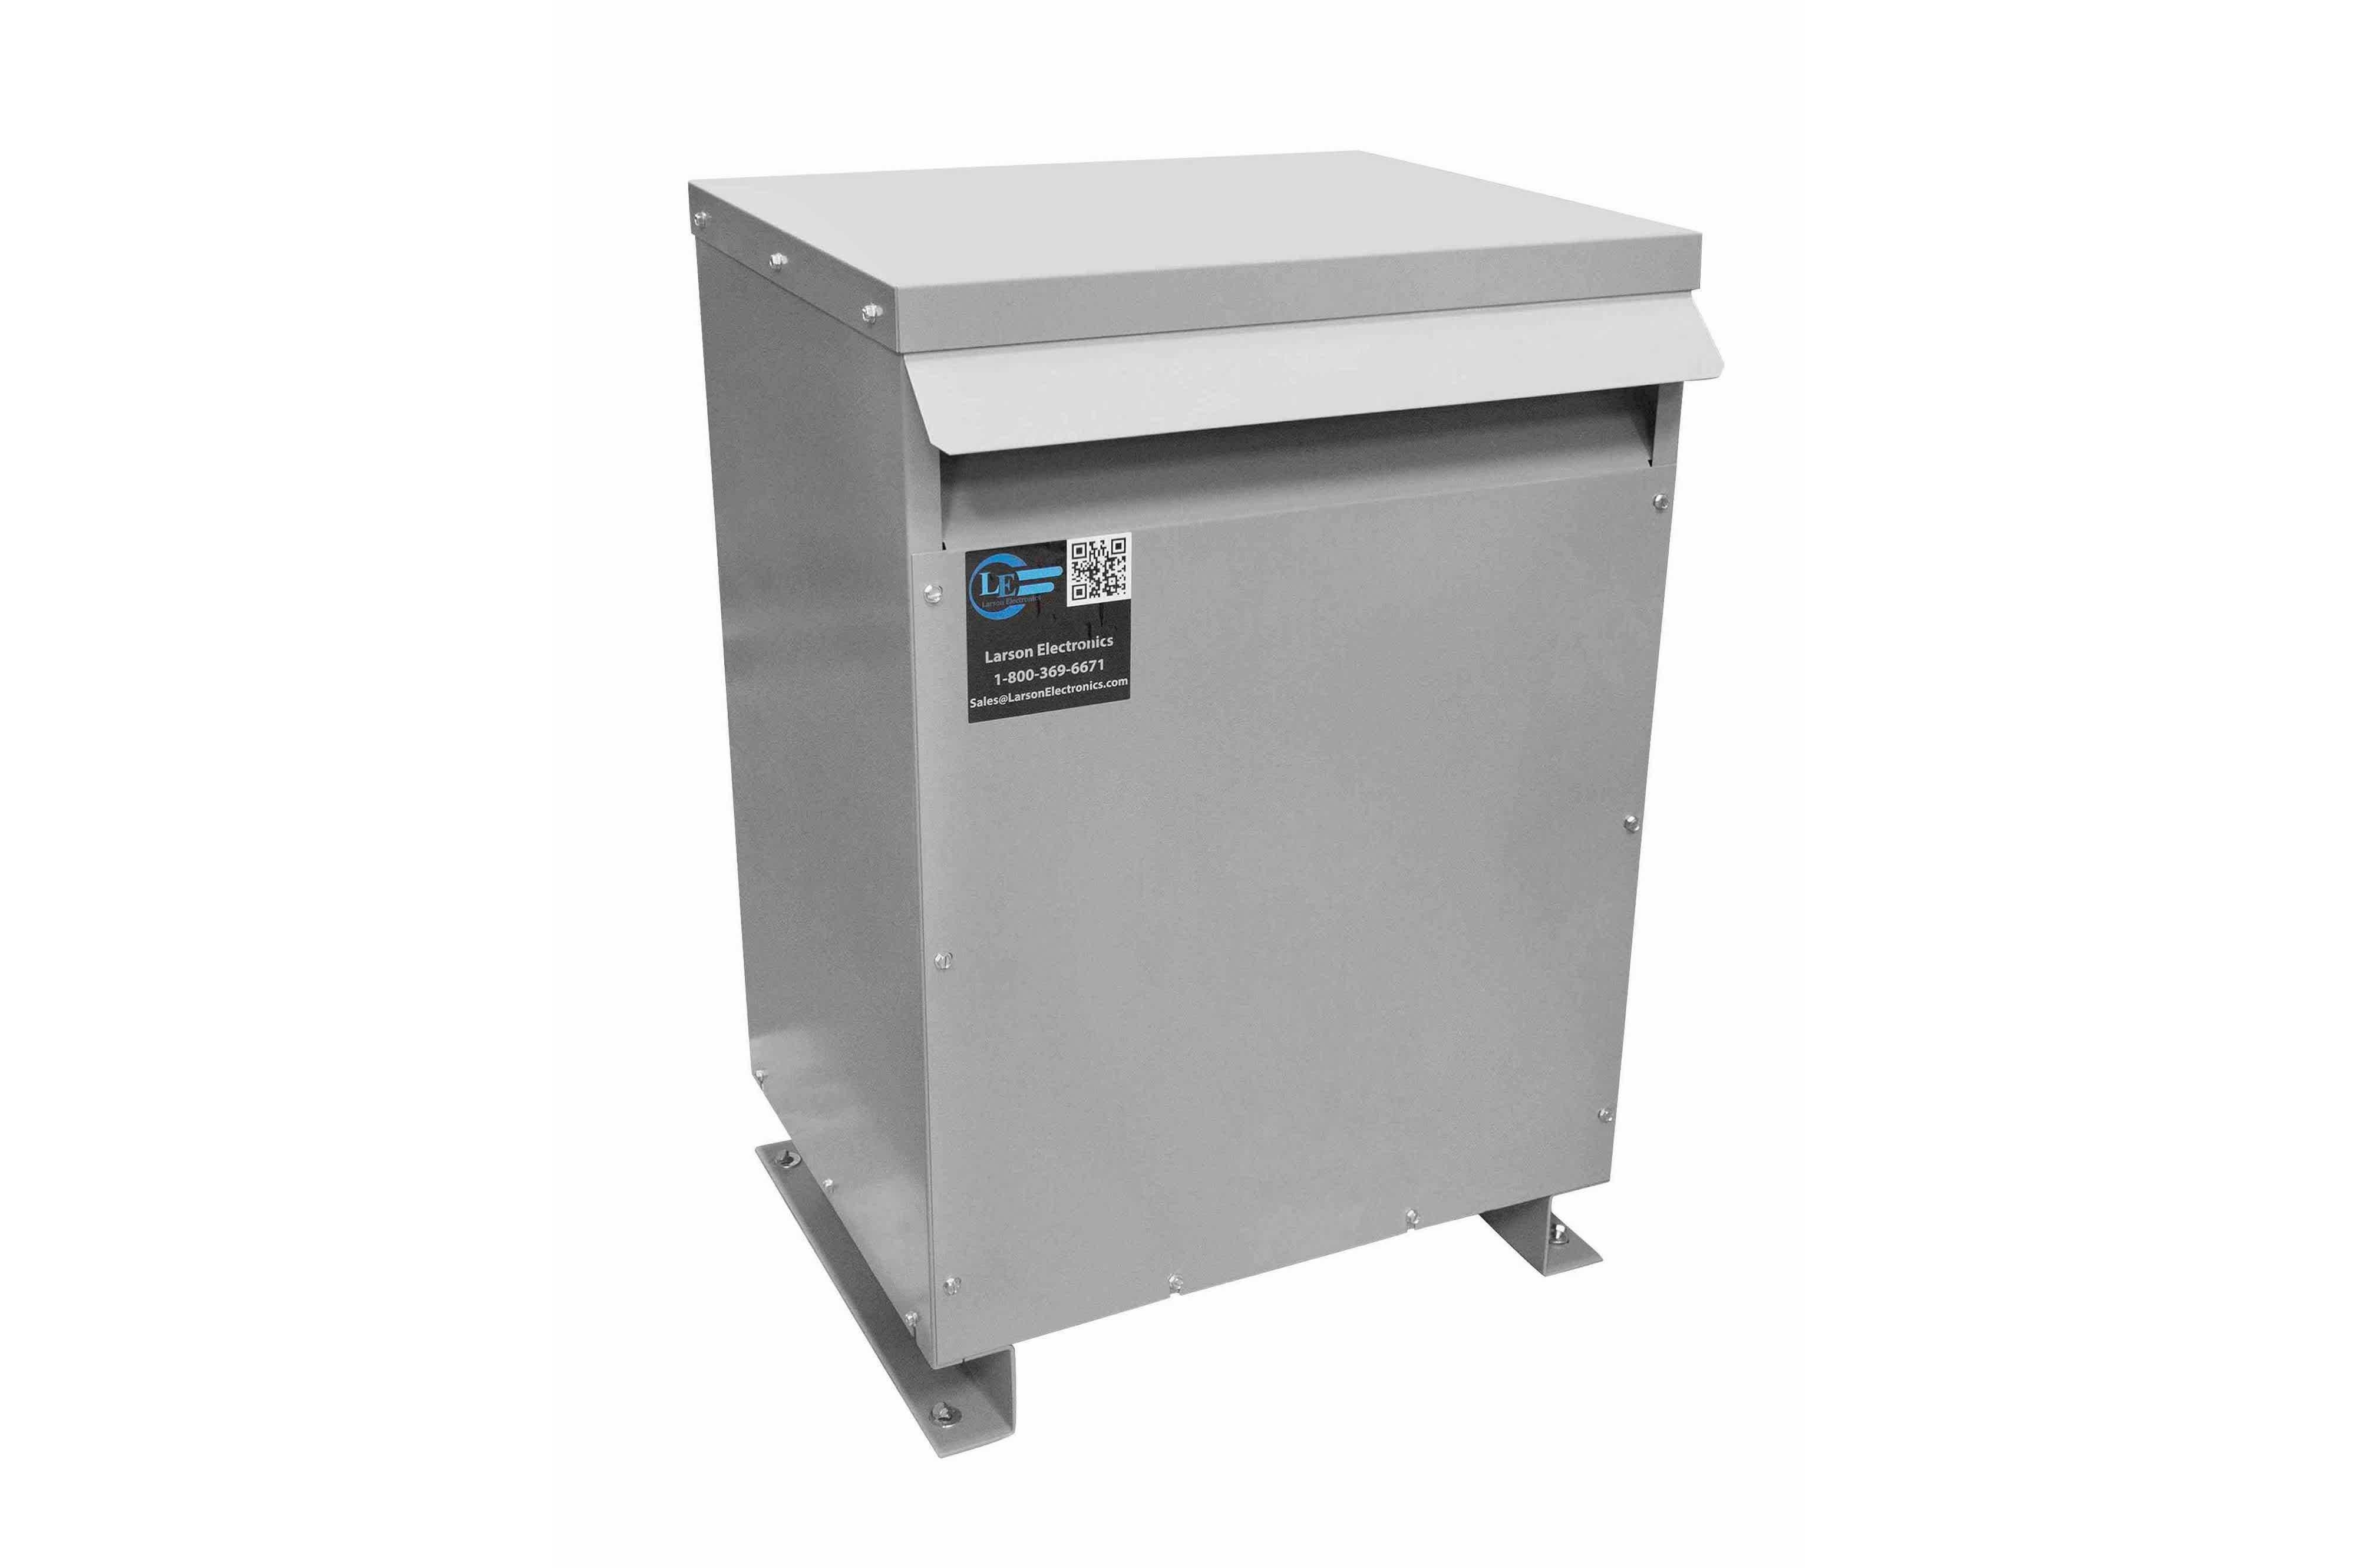 27 kVA 3PH Isolation Transformer, 208V Wye Primary, 208Y/120 Wye-N Secondary, N3R, Ventilated, 60 Hz